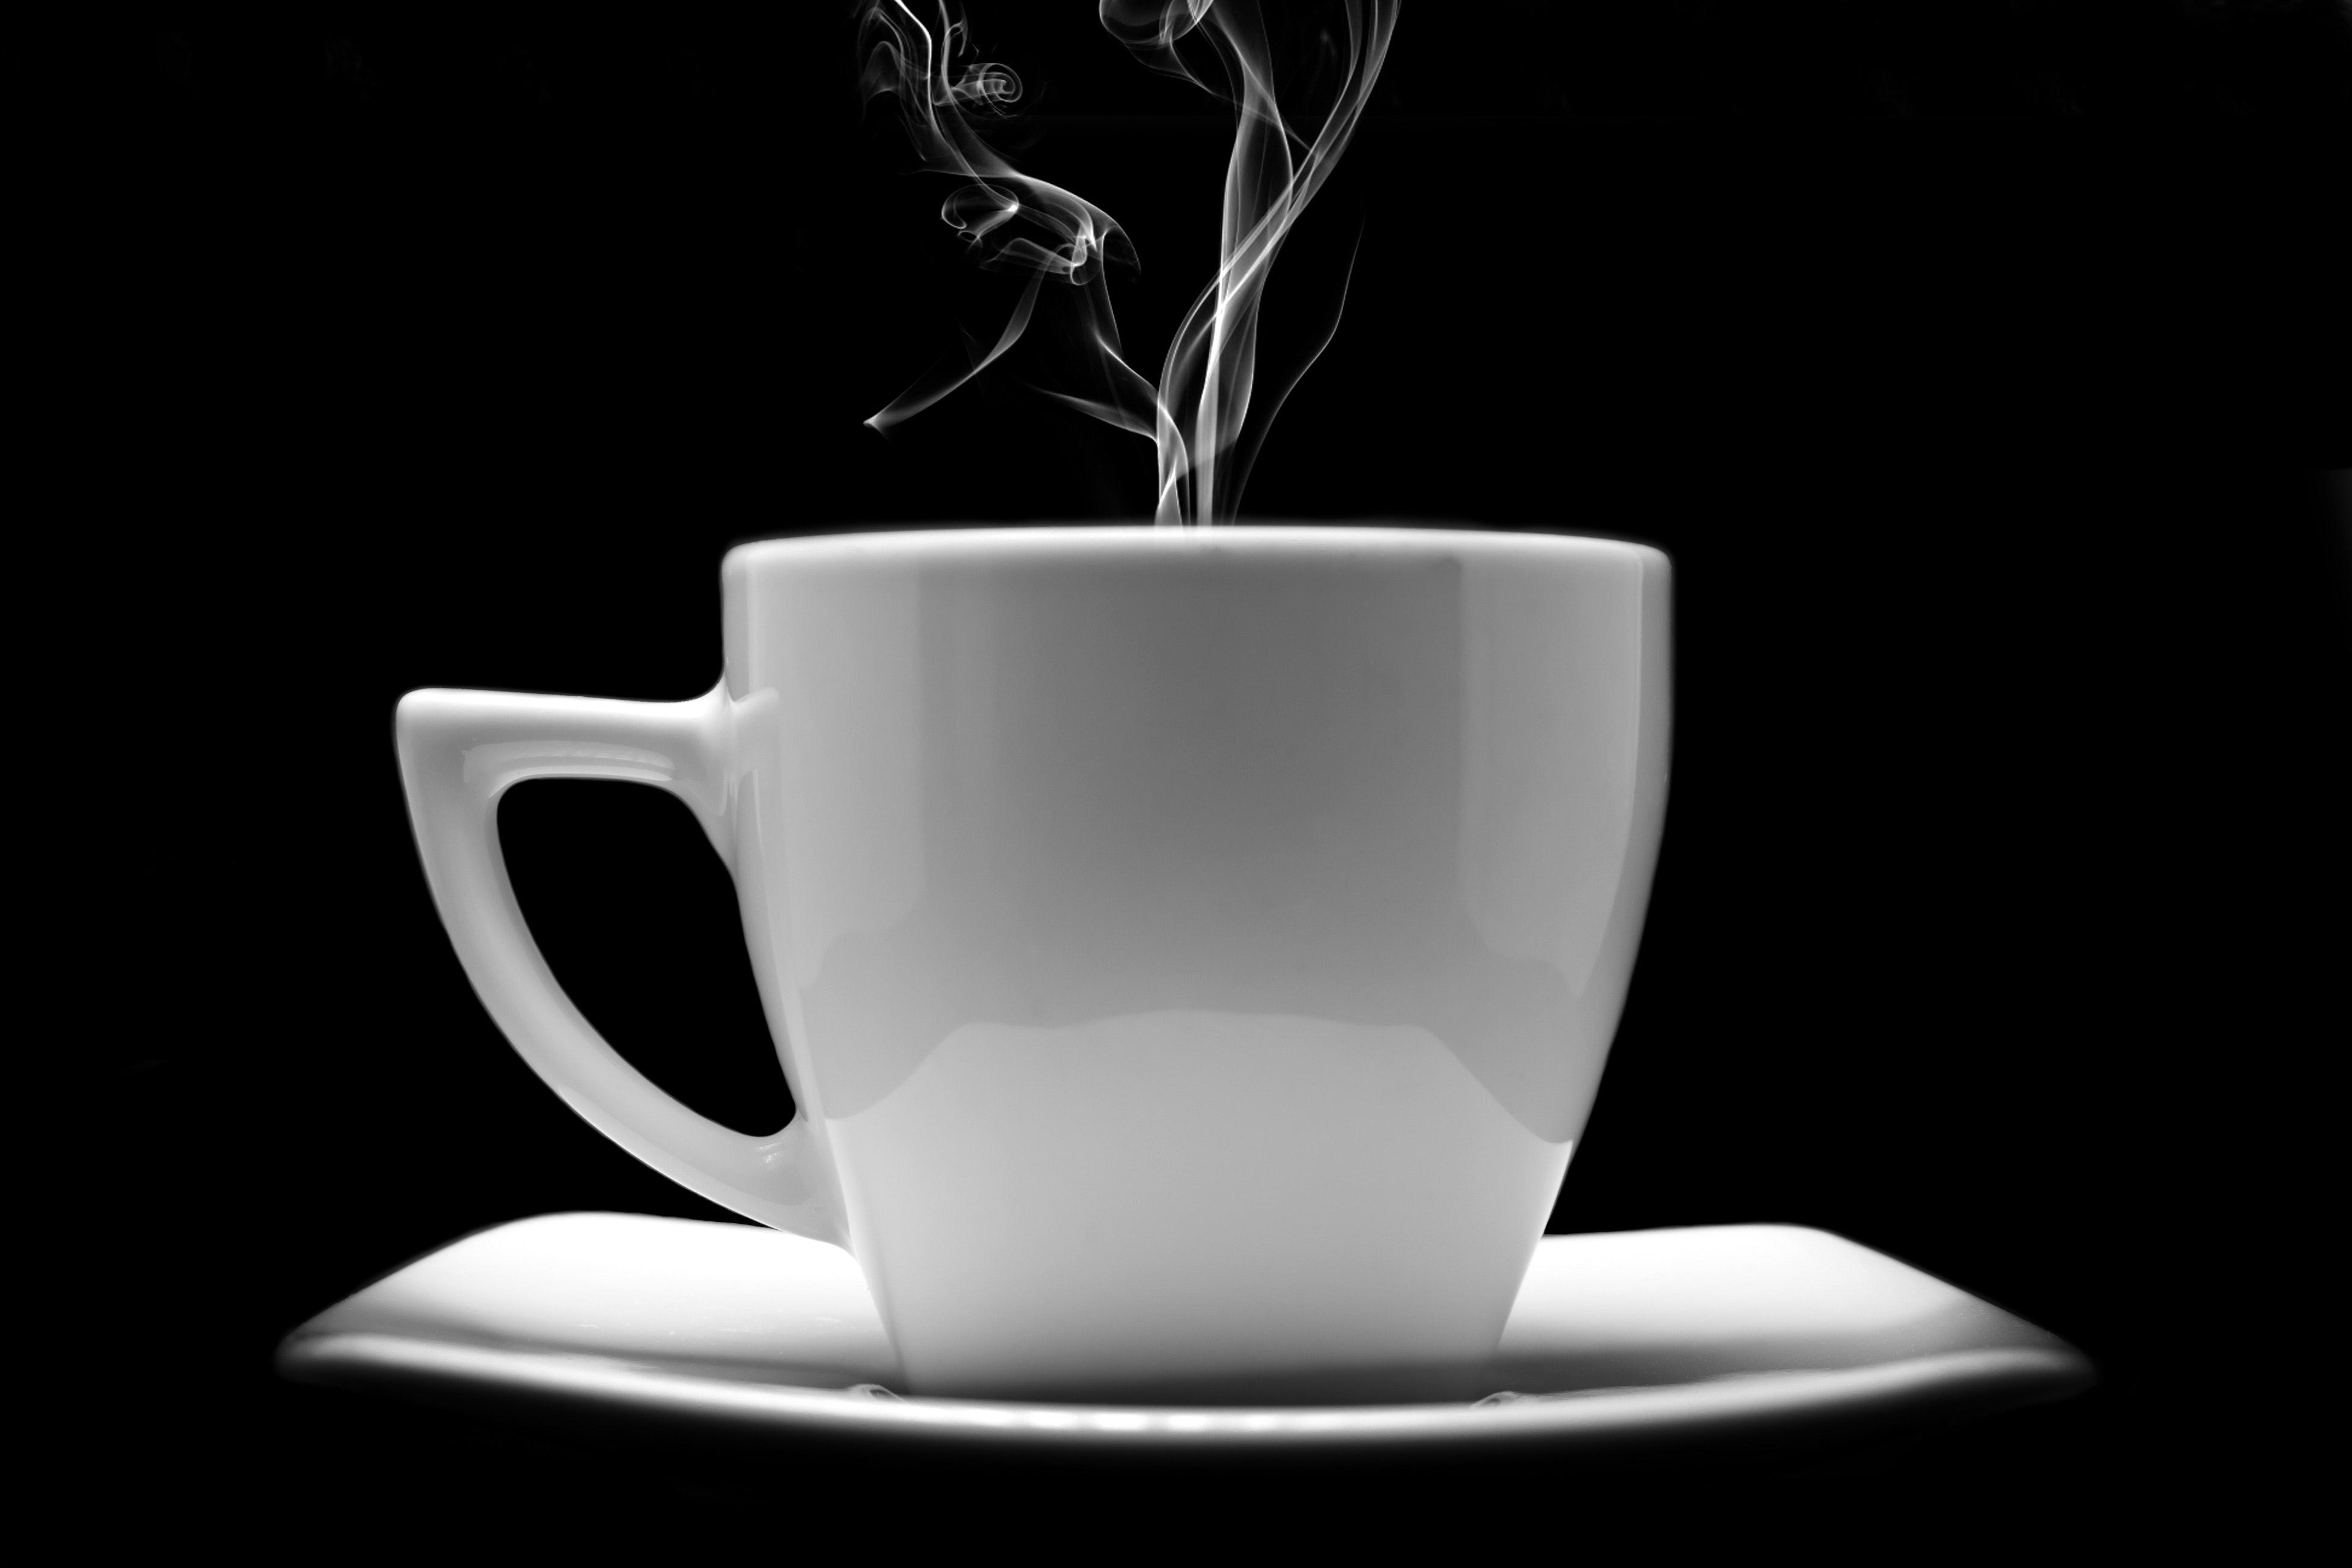 beverage-black-and-white-breakfast-266174